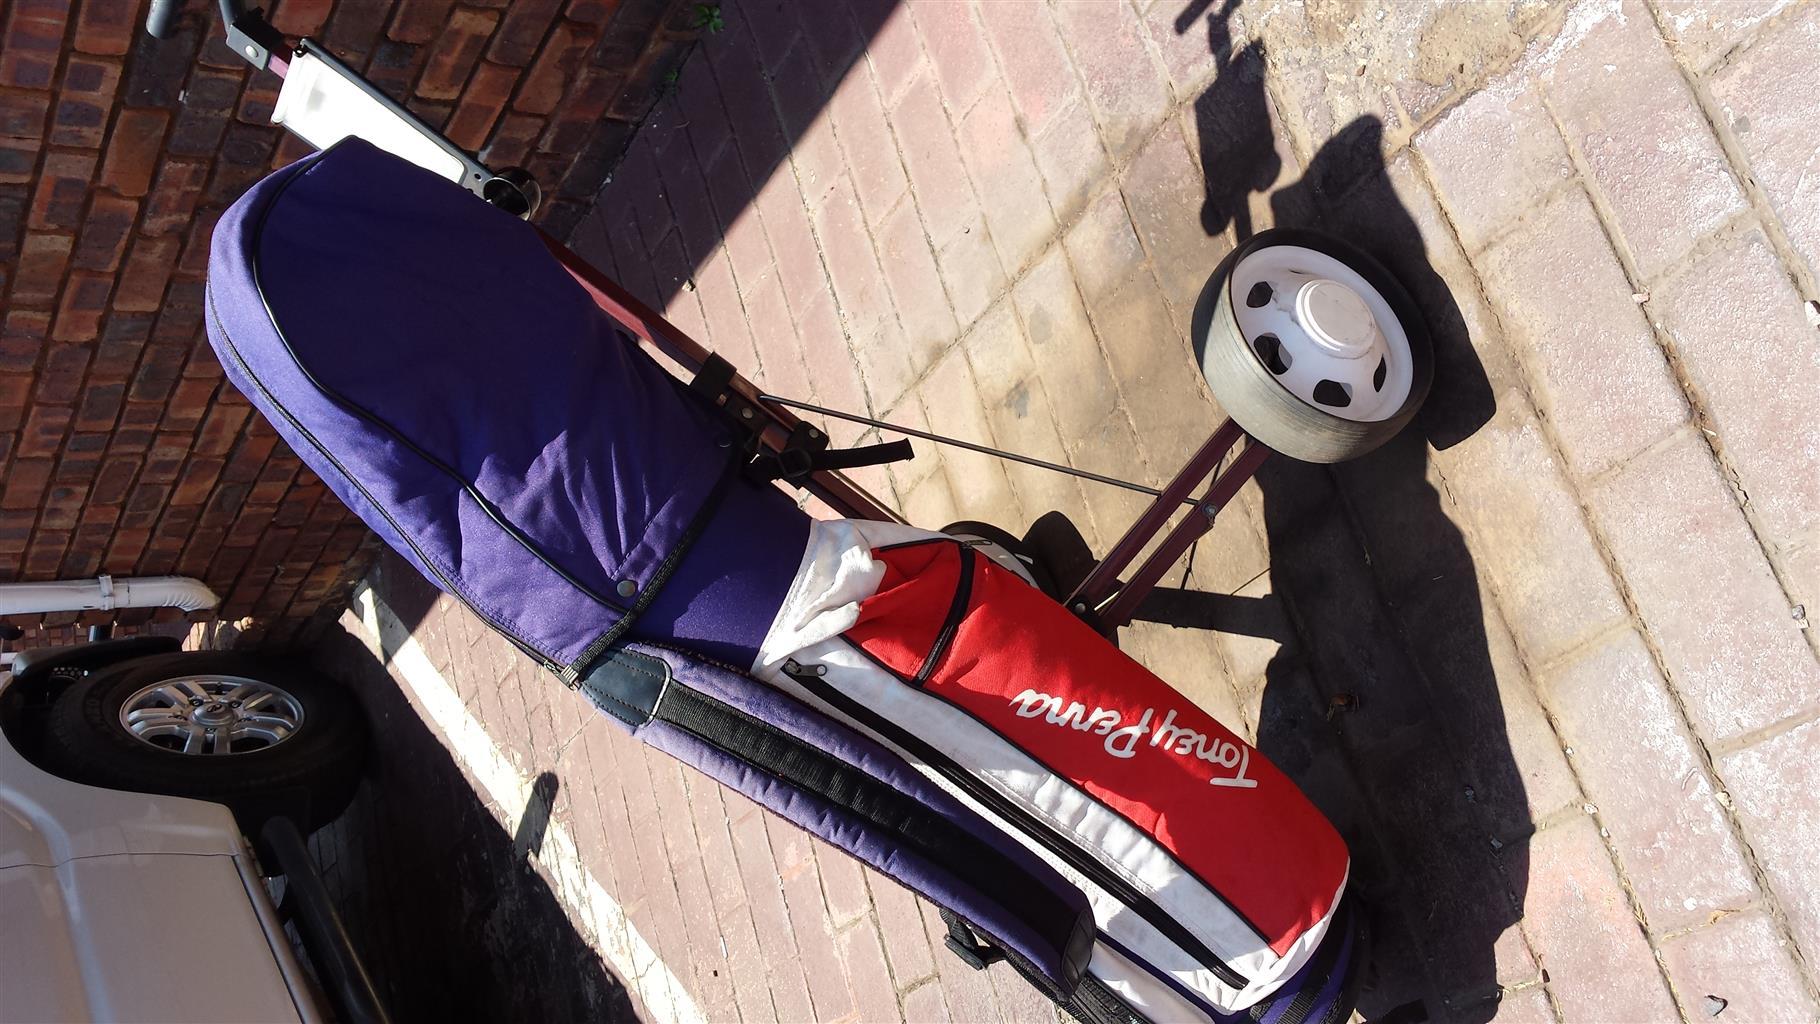 Golf set with bag and cart